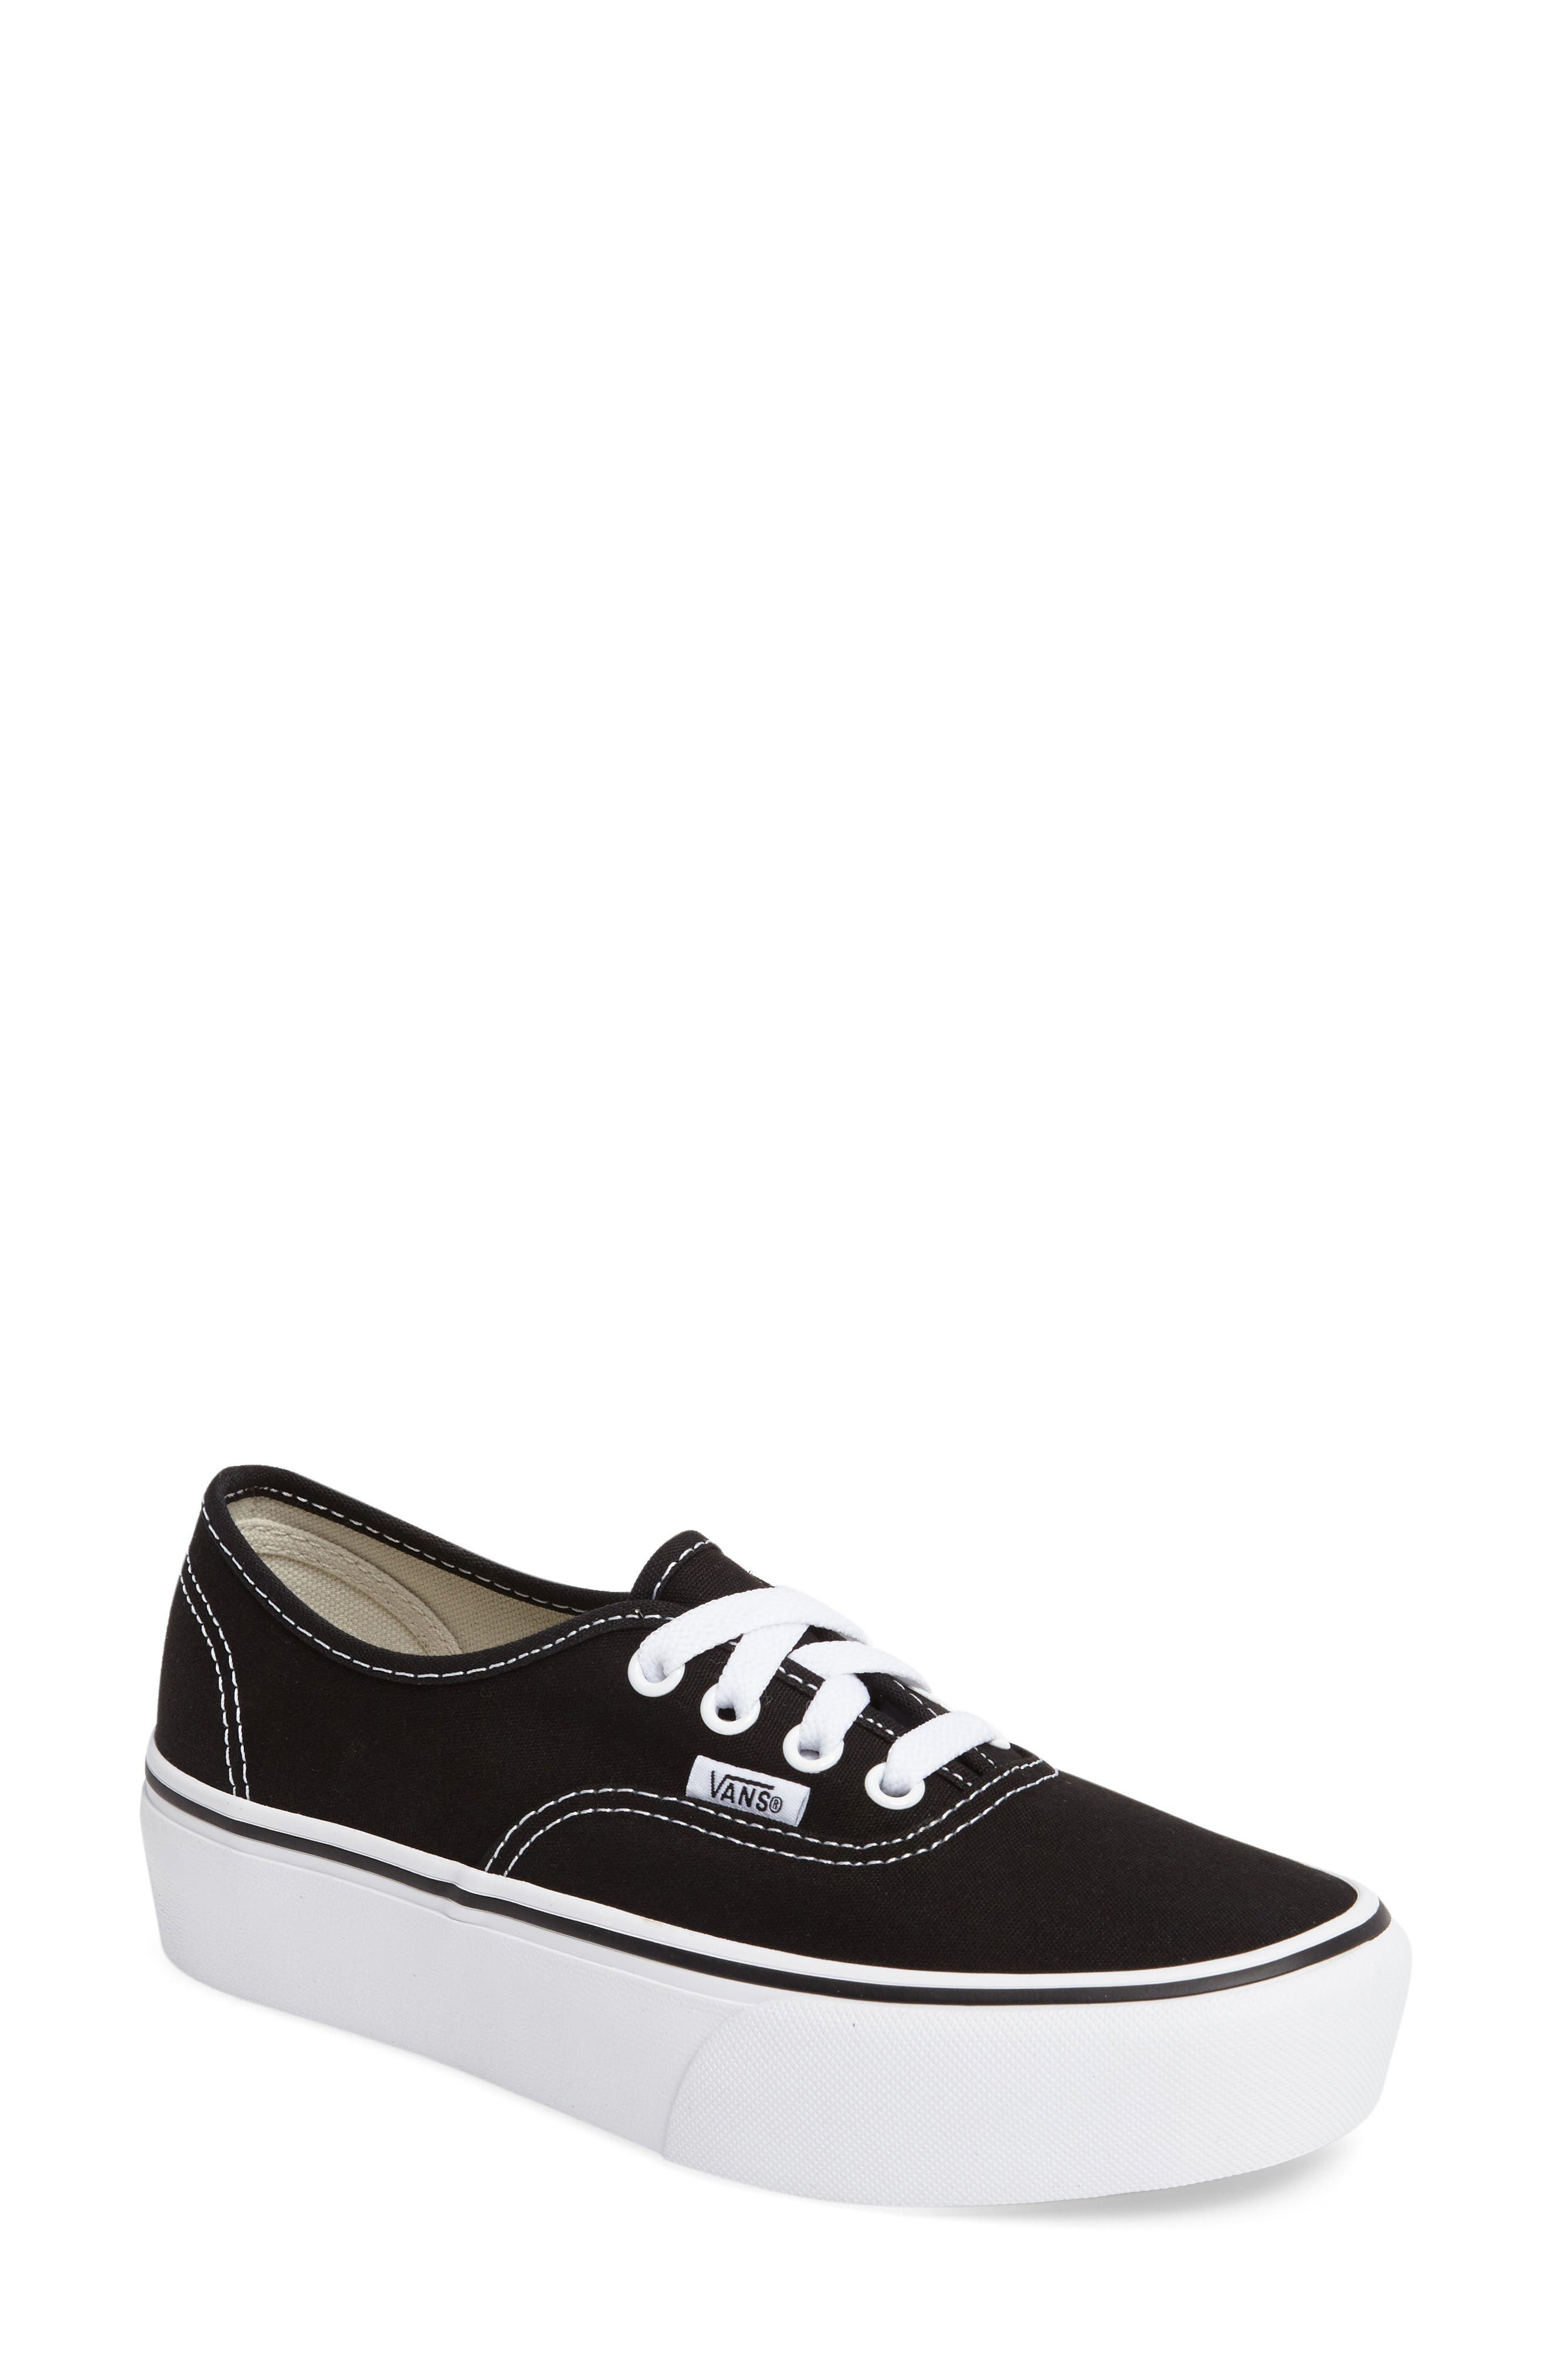 Alternate Image 1 Selected - Vans 'Authentic' Platform Sneaker (Women)